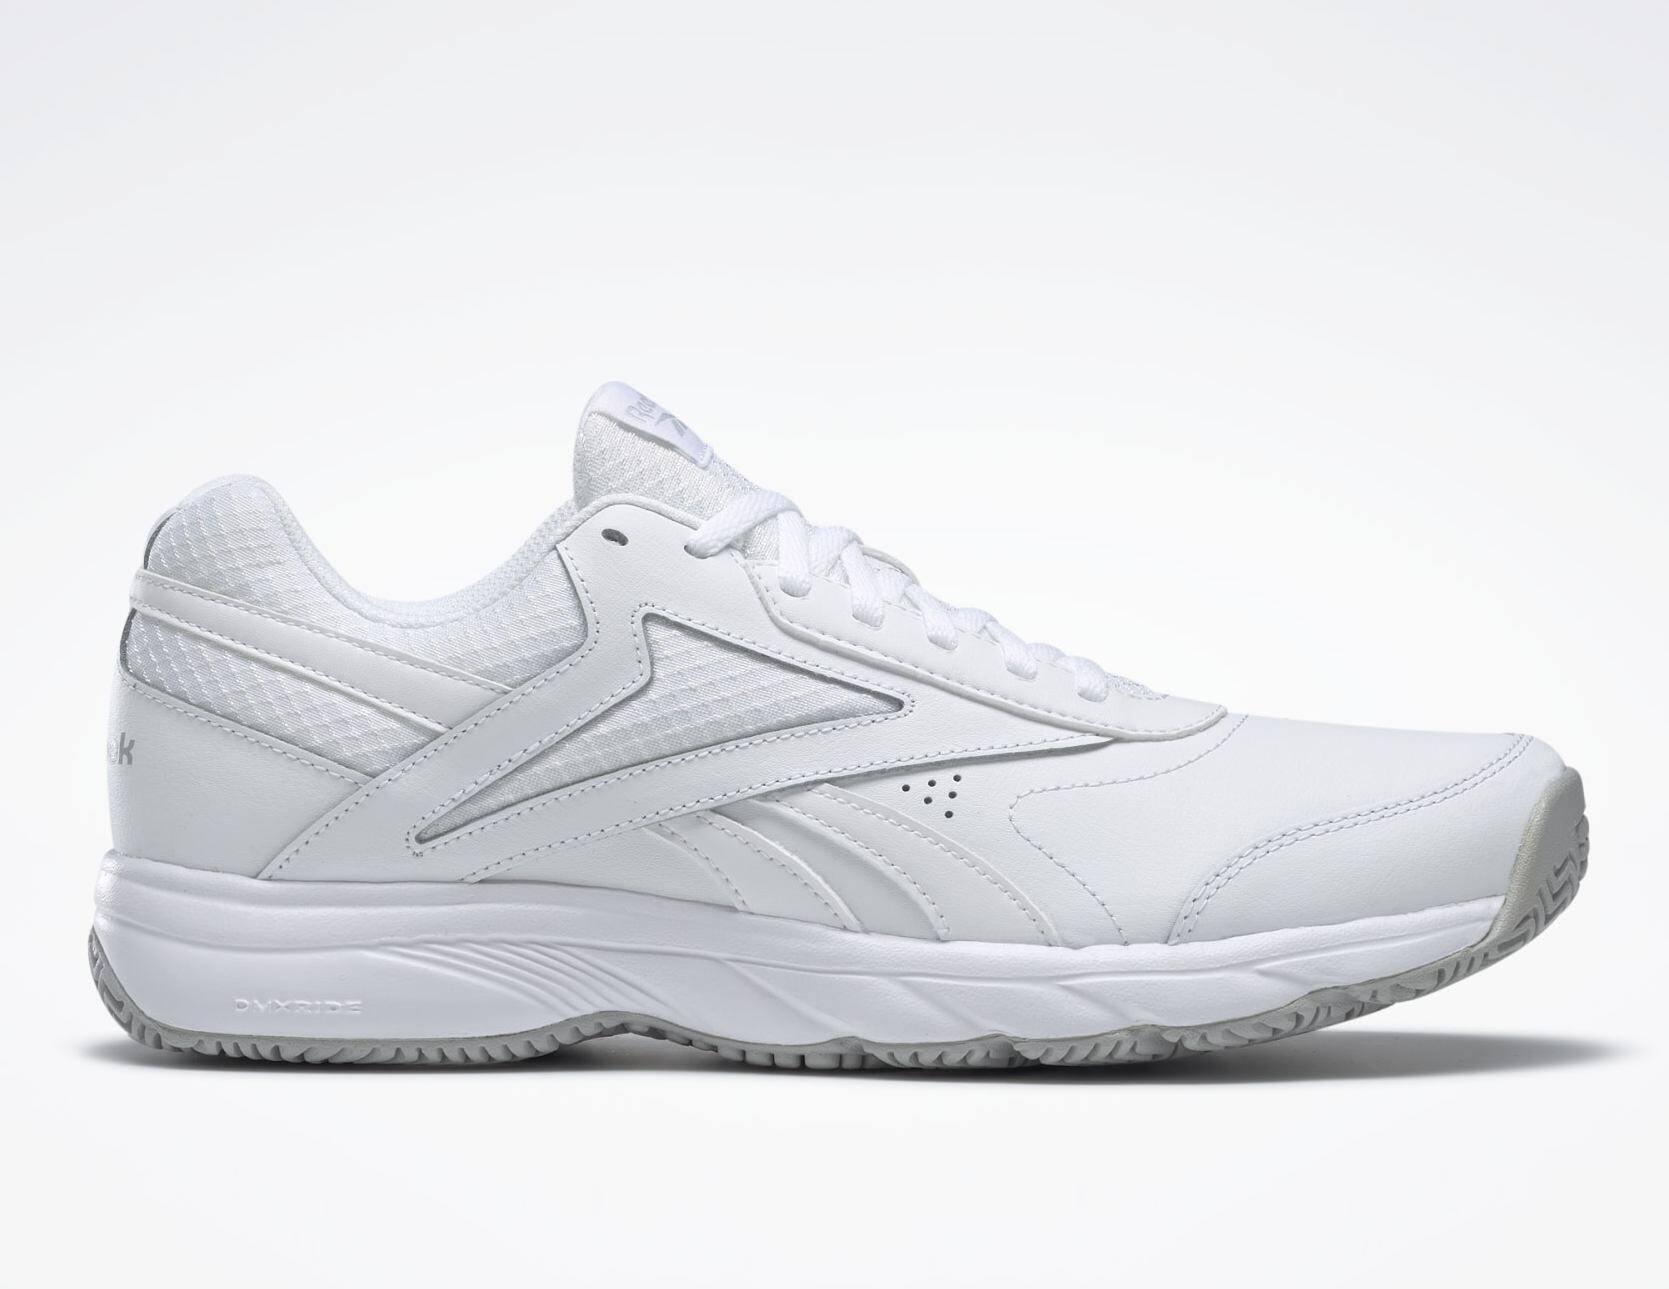 Reebok Women's Ardara 2 Walking Shoes $20, Men's Work N Cushion 4 Walking Shoes